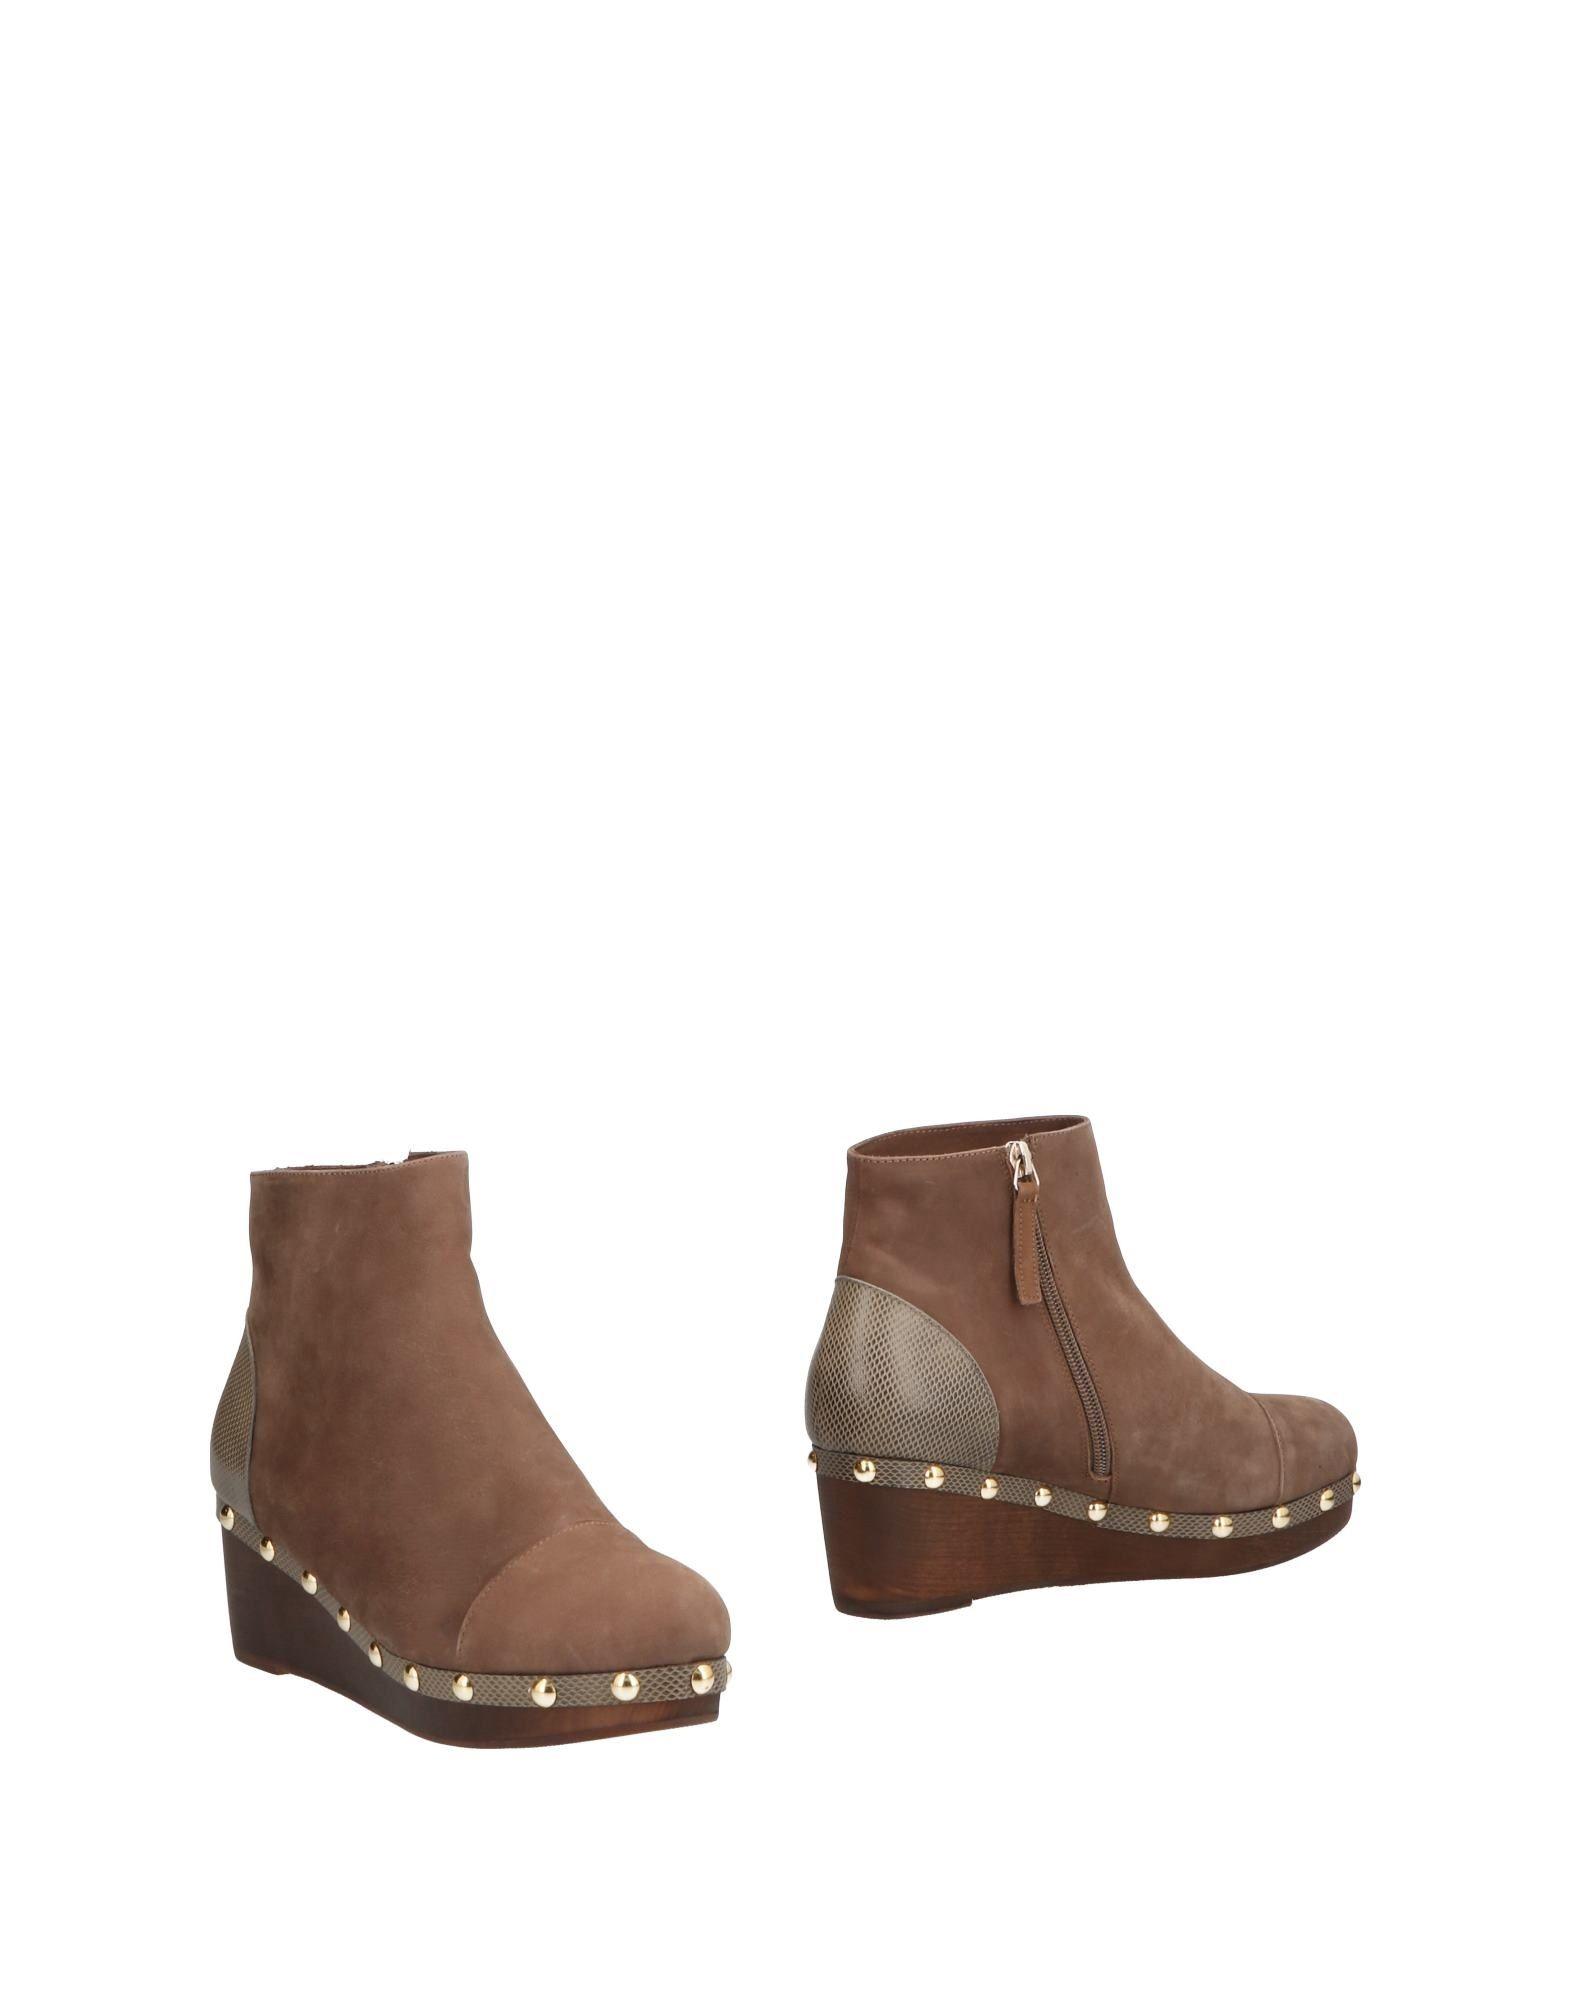 Gut um Stiefelette billige Schuhe zu tragenMi/Mai Stiefelette um Damen  11505916JK 3897ce